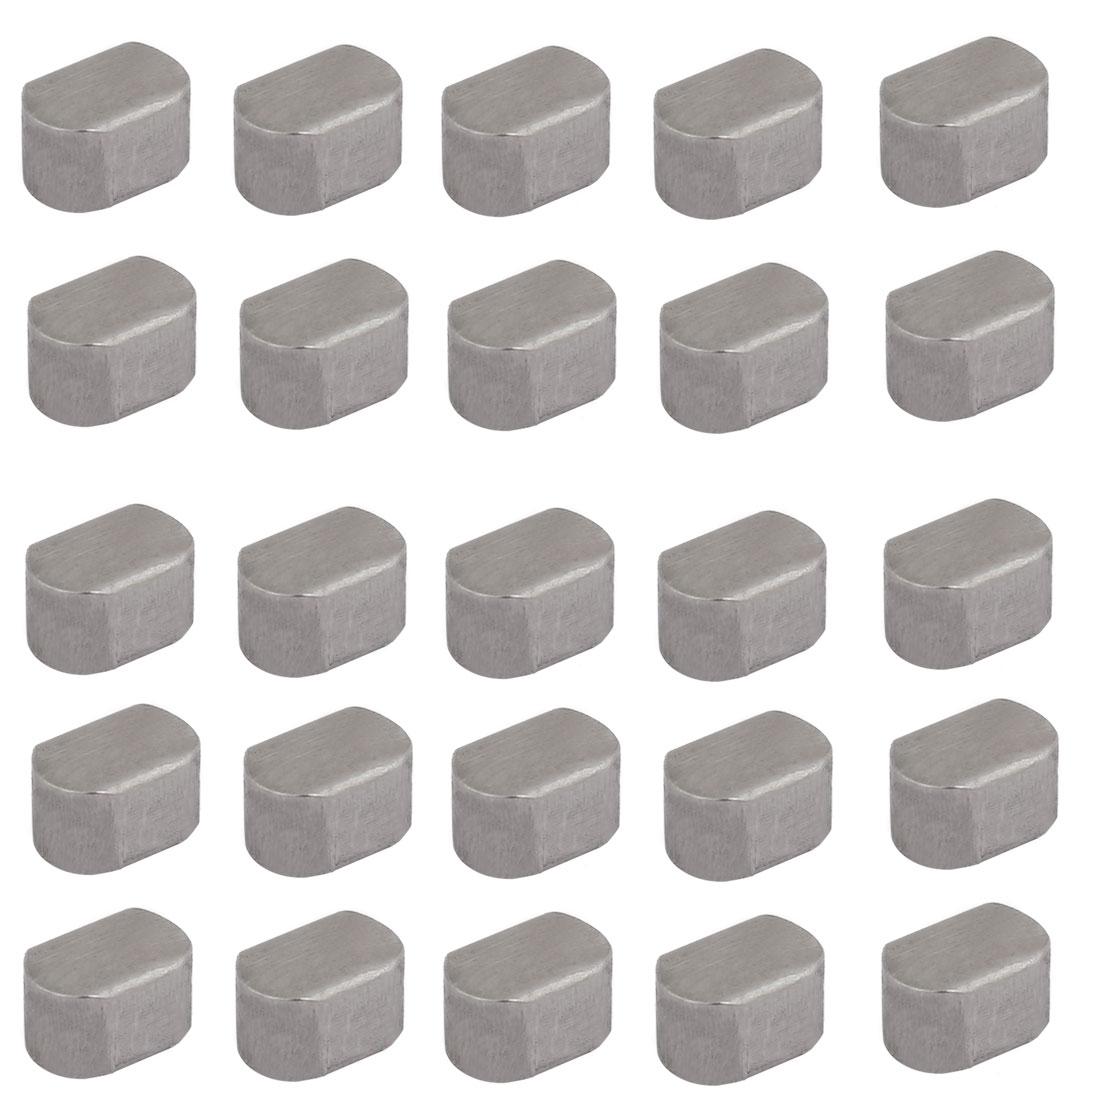 12mmx8mmx7mm Carbon Steel Key Stock To Lock Pulleys 25pcs